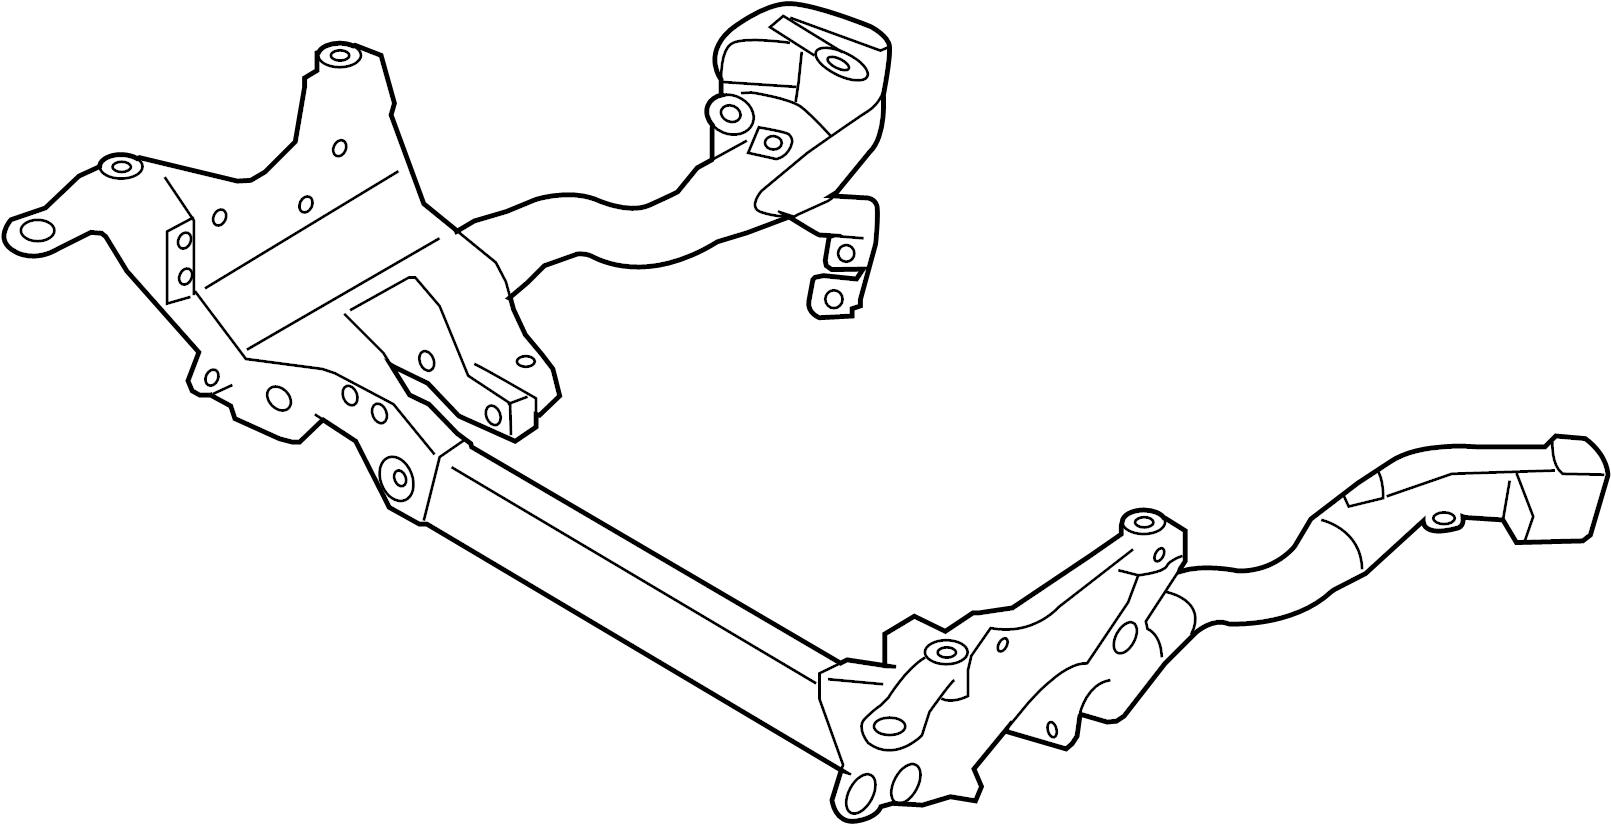 Audi A4 Engine Cradle Subframe